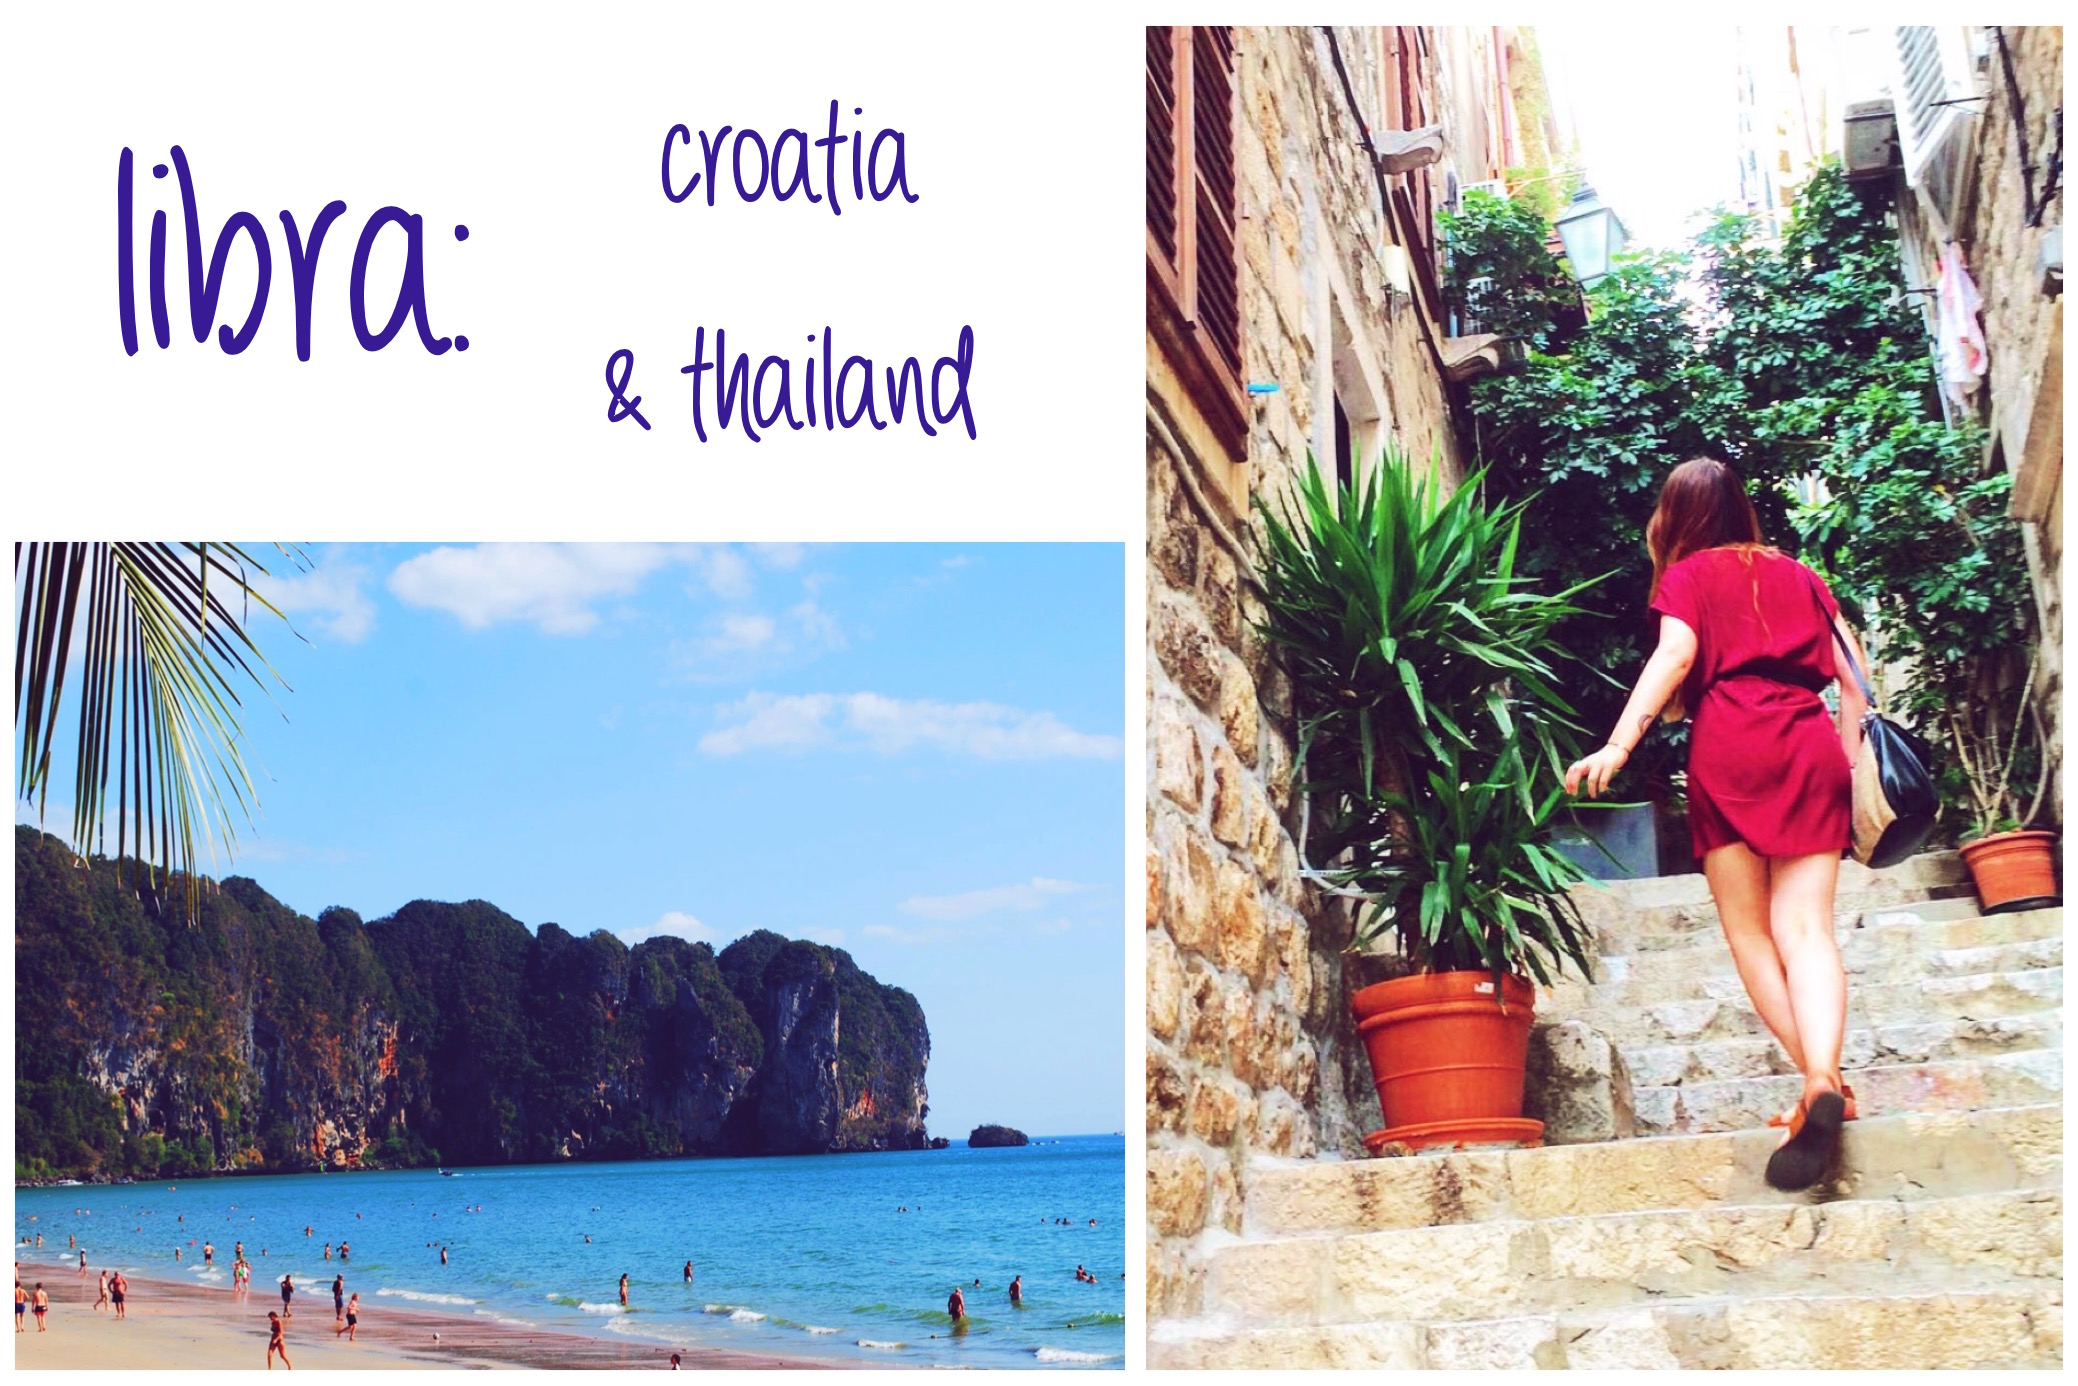 photo credit, croatia: instagram.com/elitravelbug/ // photo credit, thailand: Sam Gross, thereshegoesagain.org